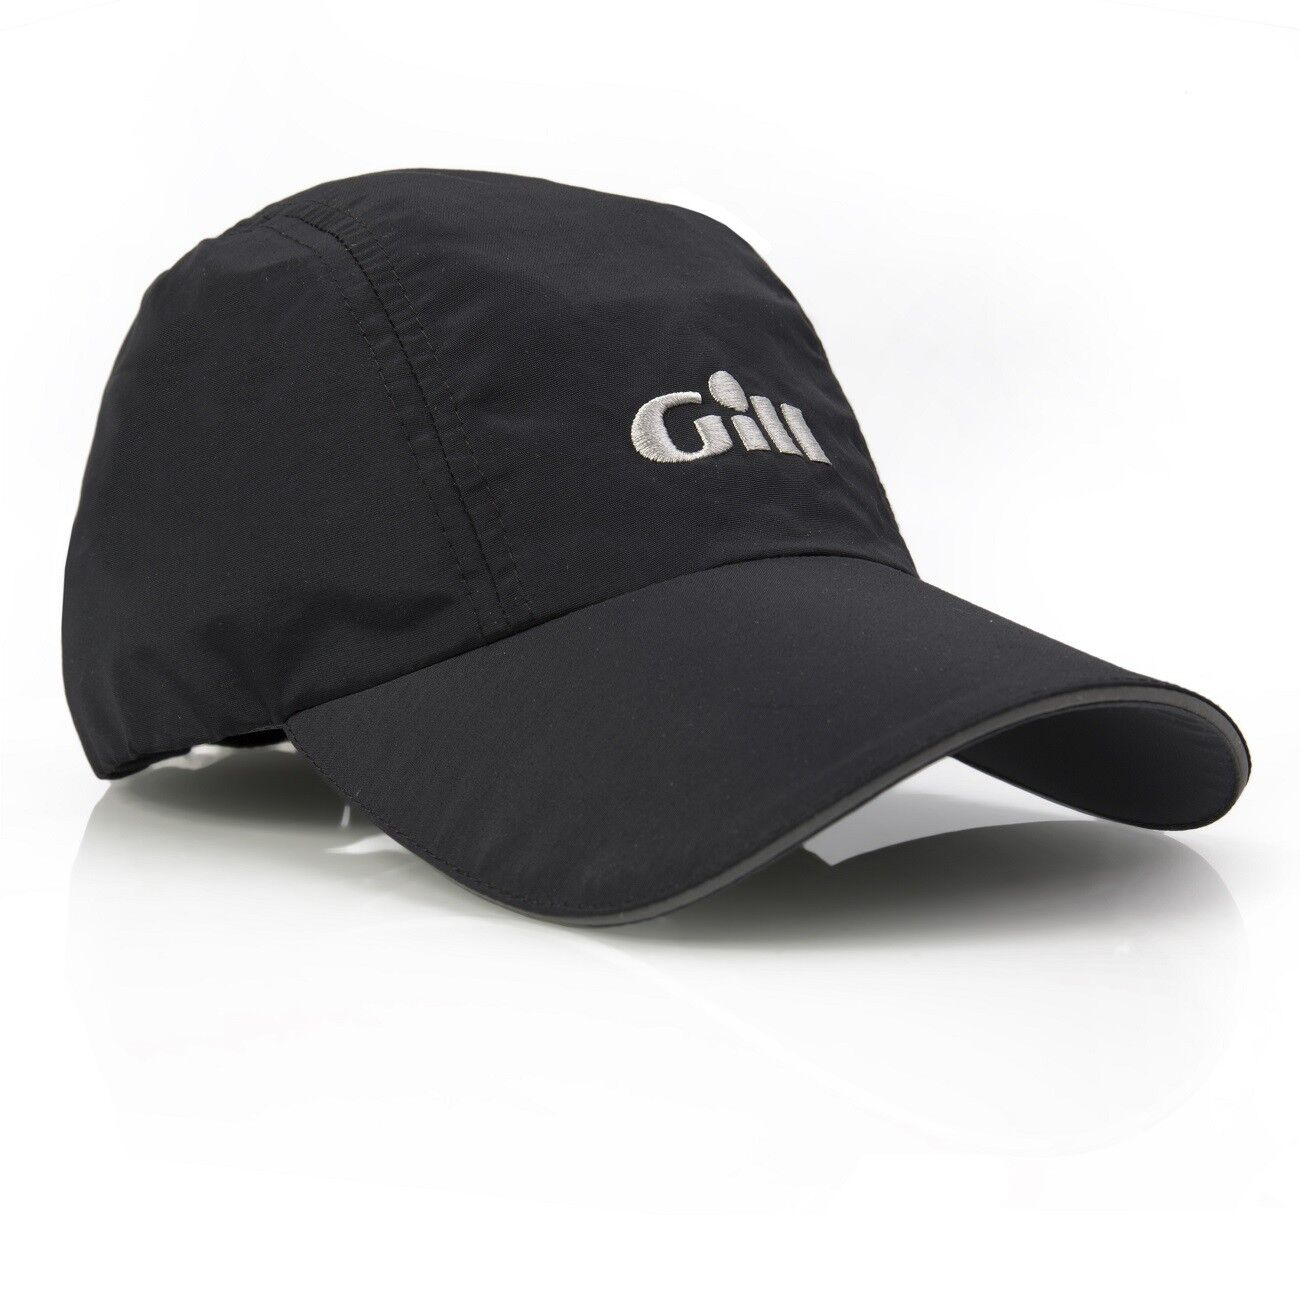 Gill Damen Herren Regatta Cap Sailing Baseballcap Kappe Kopfbedeckung Segelcap